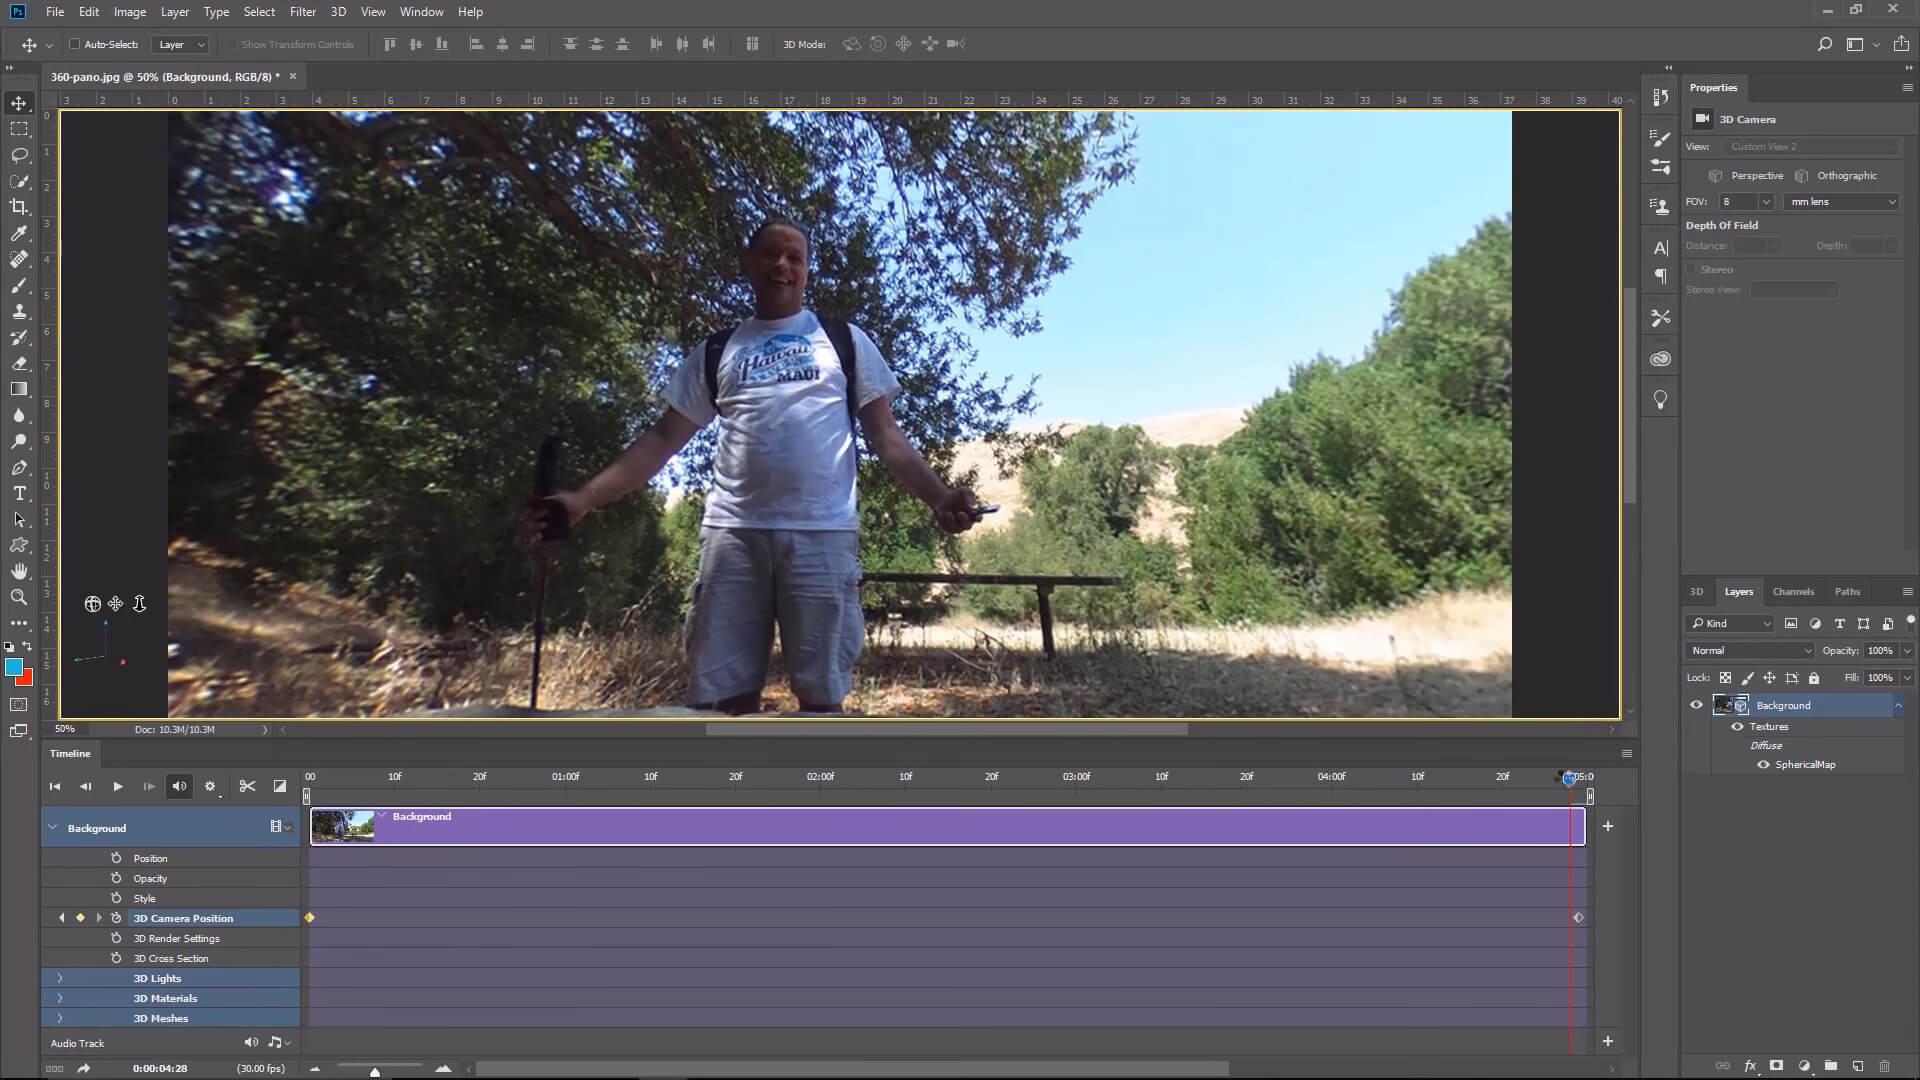 Adobe Photoshop Ücretsiz